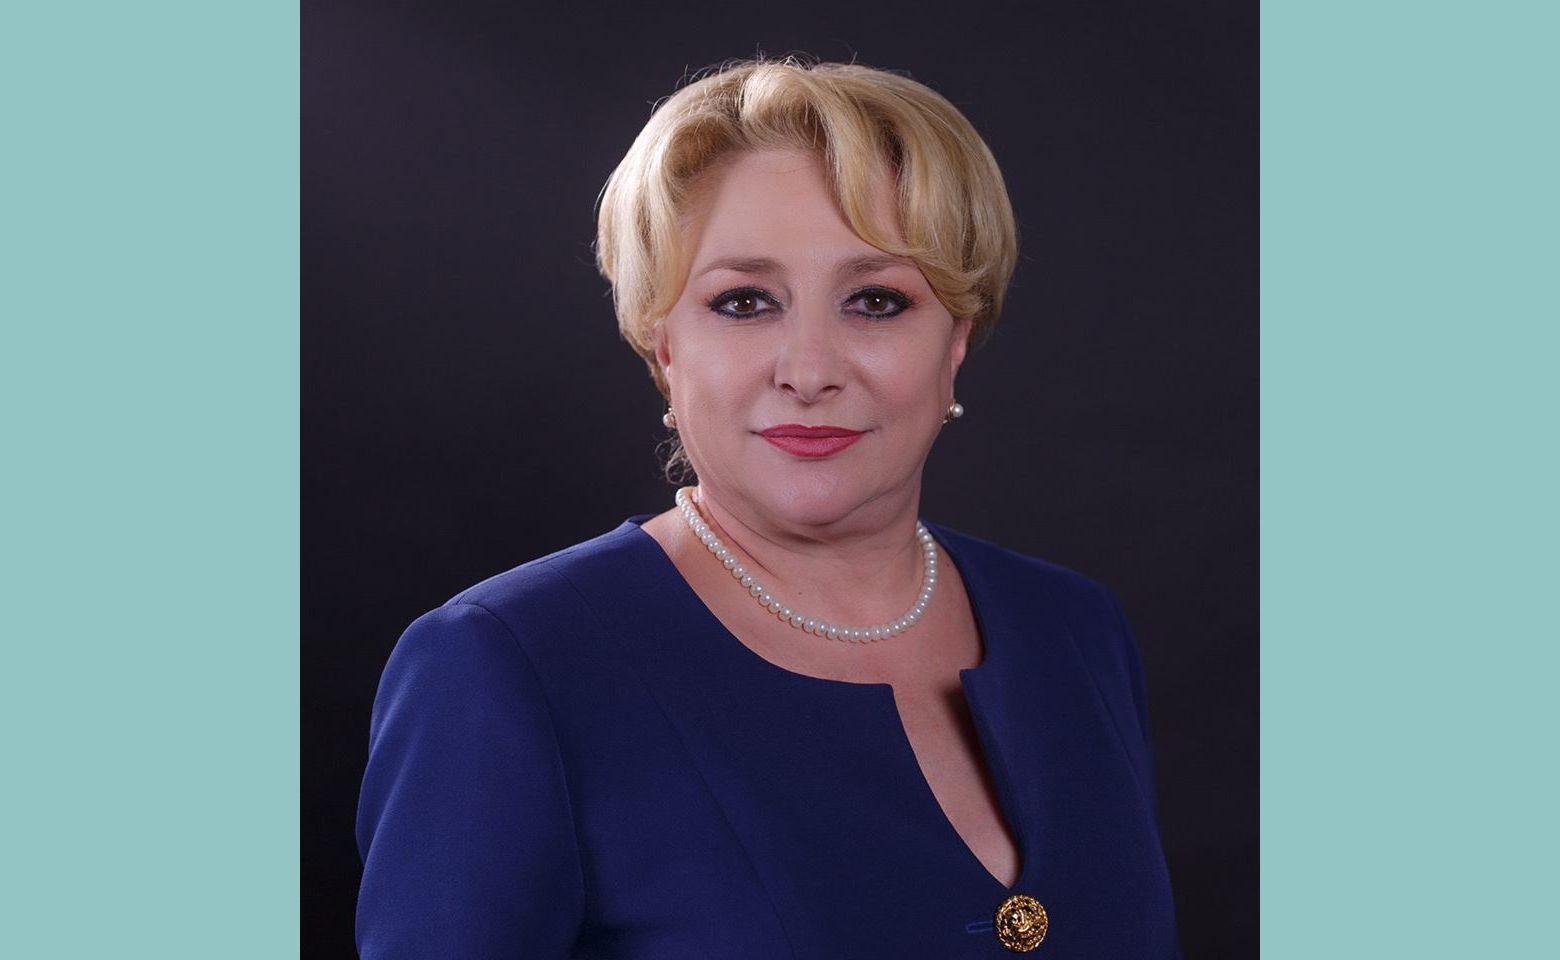 Romanian ruling coalition proposes MEP Viorica Dancila for PM